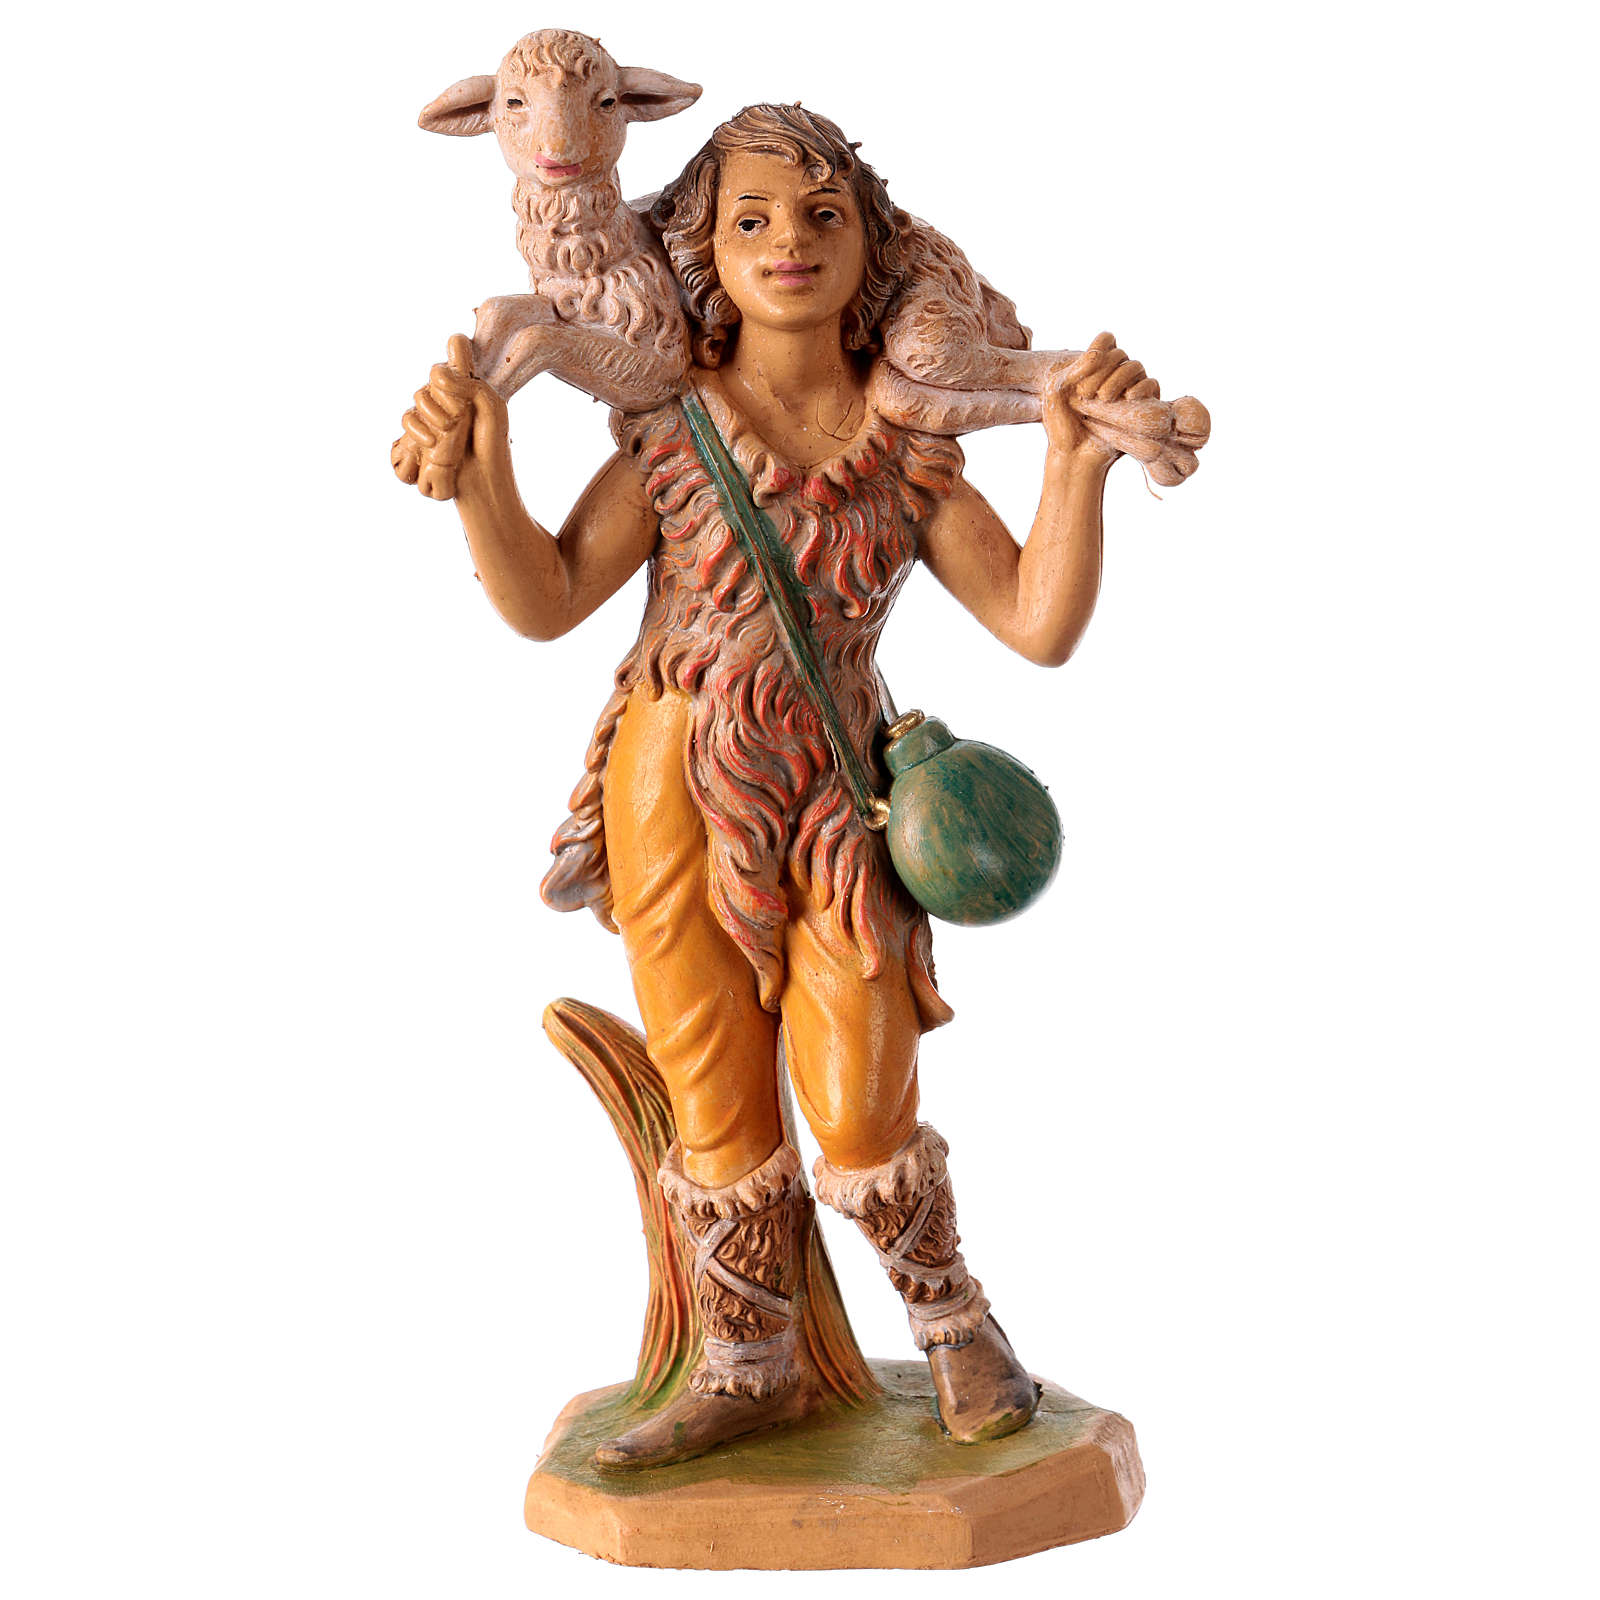 Estatua Hombre con oveja sobre las espaldas 16 cm de altura media para belén 3